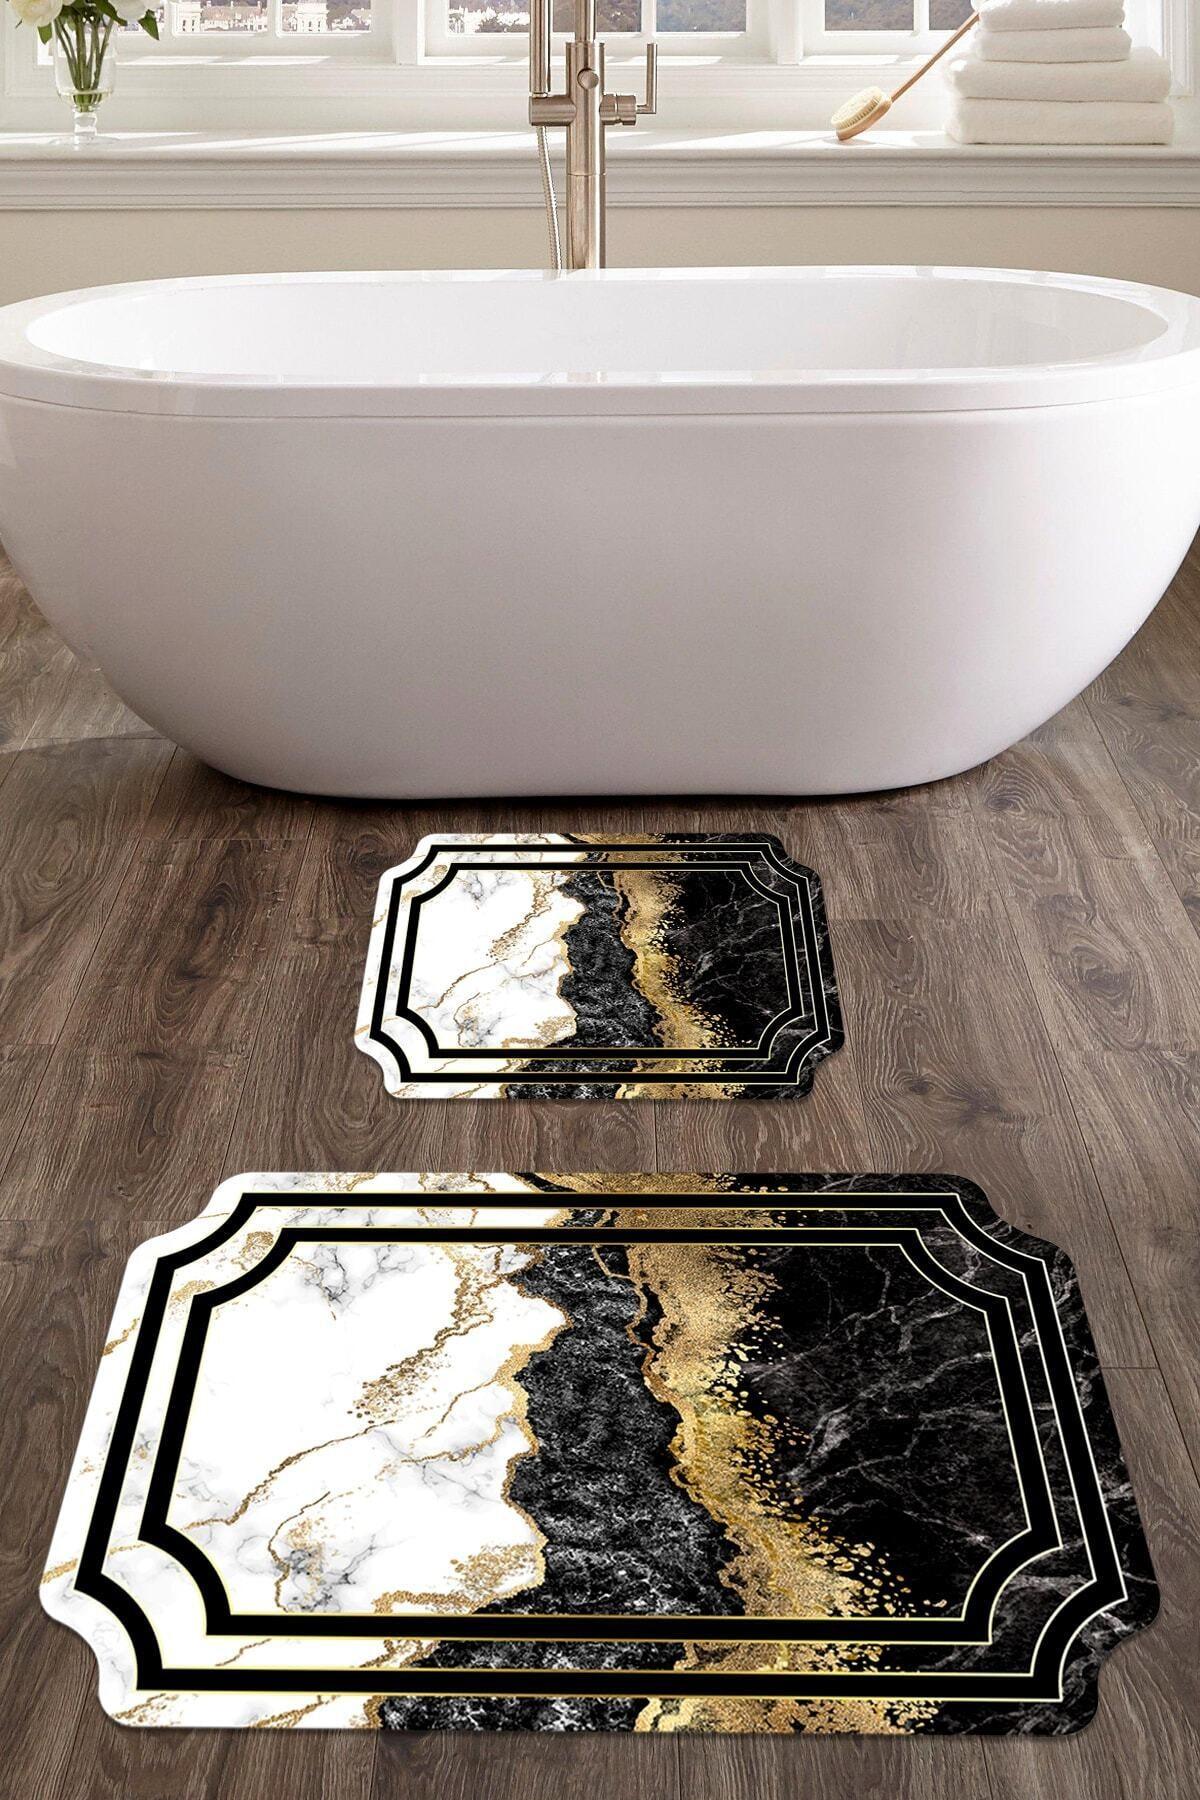 colizon 60x90 - 50x60 Prestij Dijital Banyo Halısı Lazer Kesim Klozet Takımı 2'li Paspas Seti 1